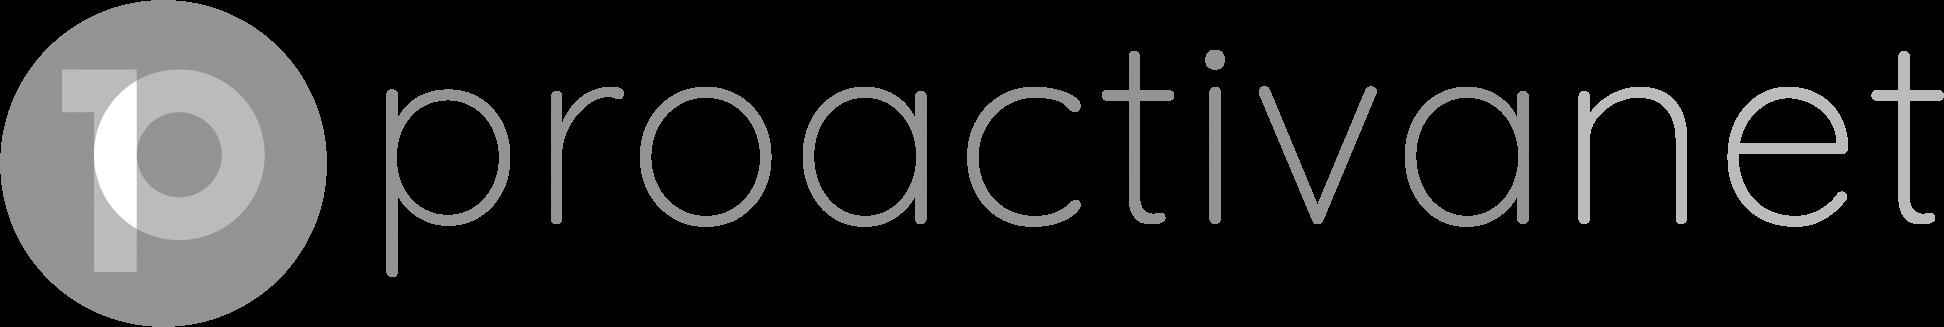 Logo-proactivanet@2x_bn